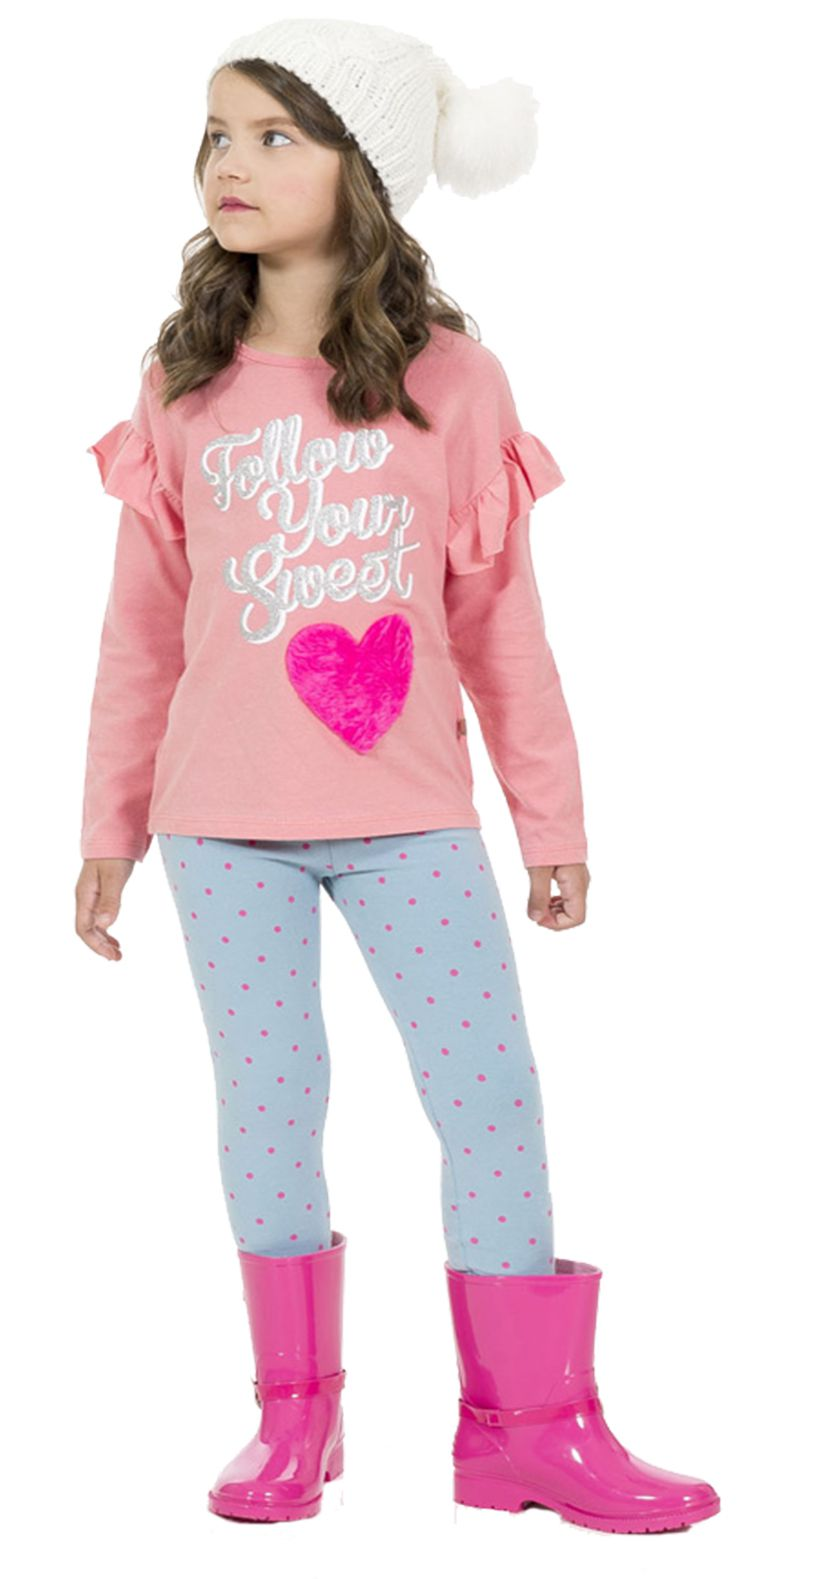 Conjunto Coração Pink Tinkbink